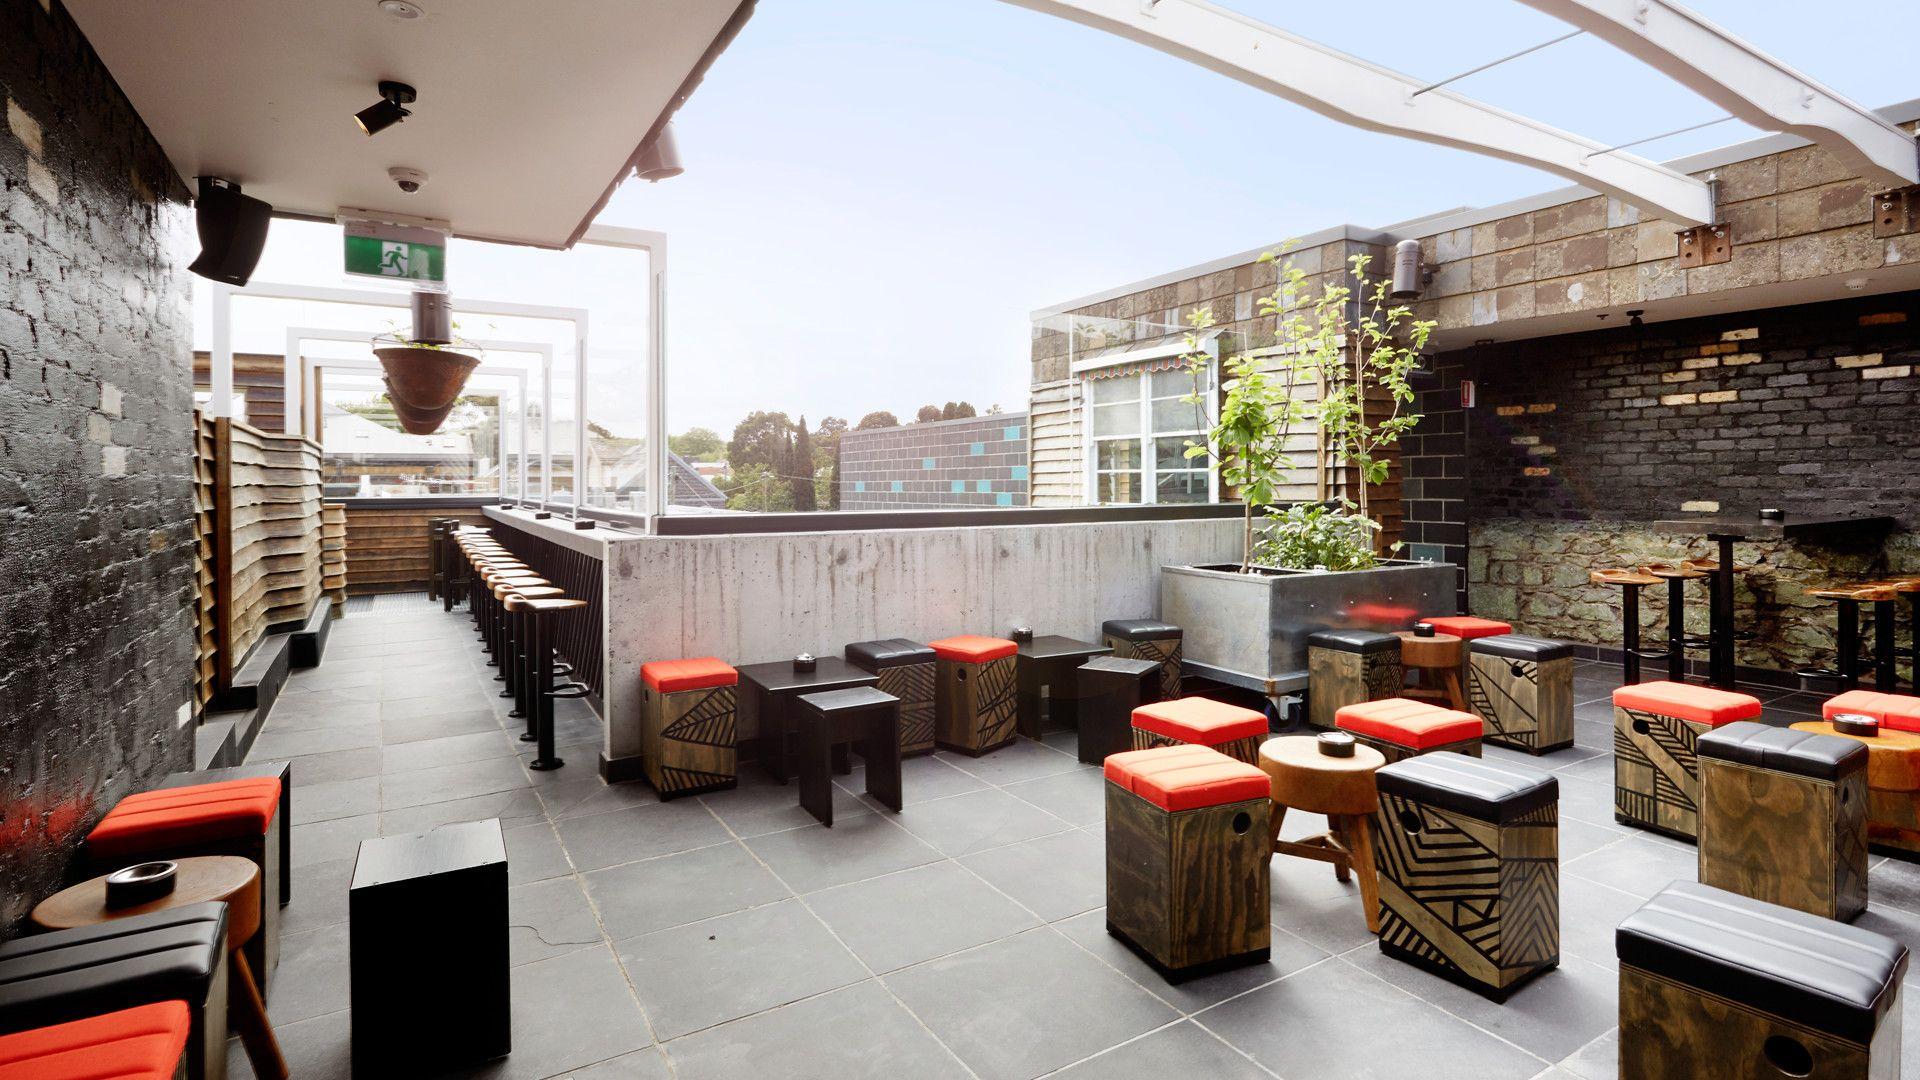 40 Best Rooftop Bars in Melbourne | Design, Ideias